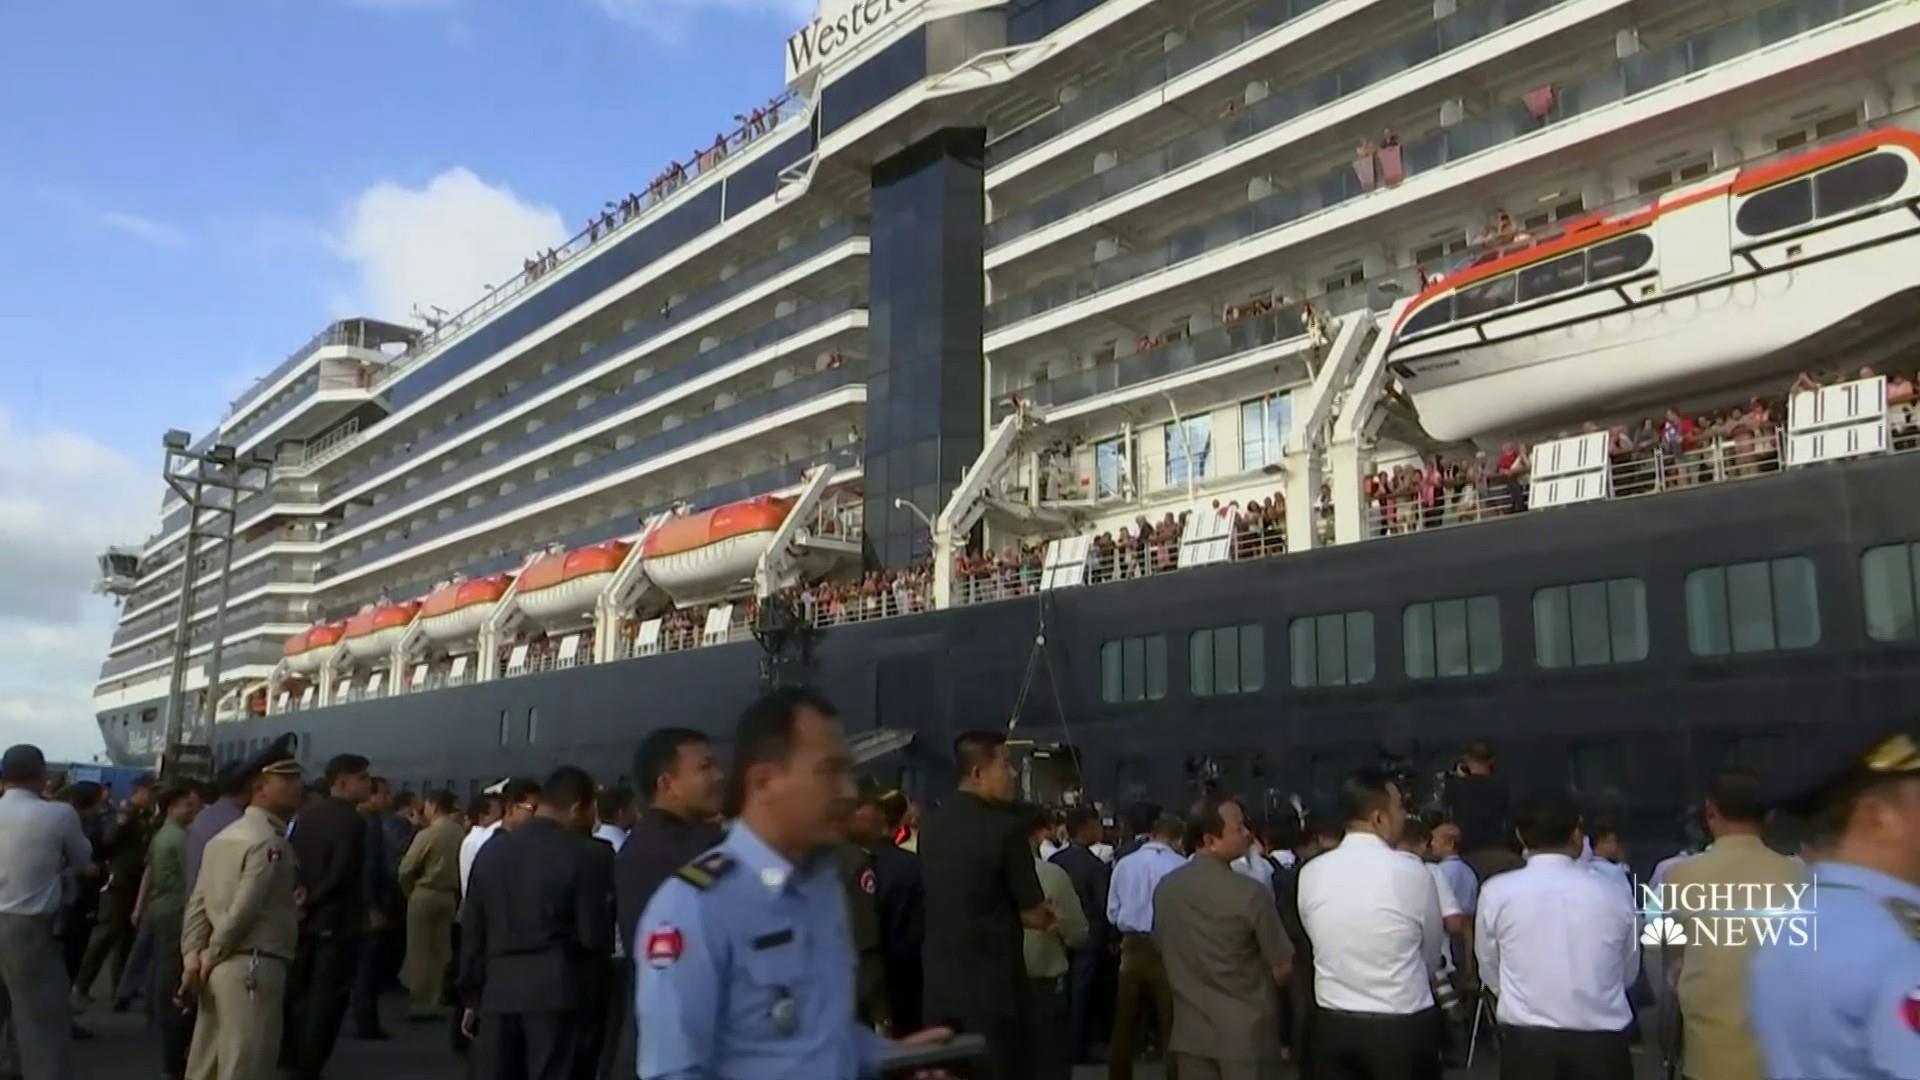 Passengers quarantined because of coronavirus begin leaving Diamond Princess ship in Japan